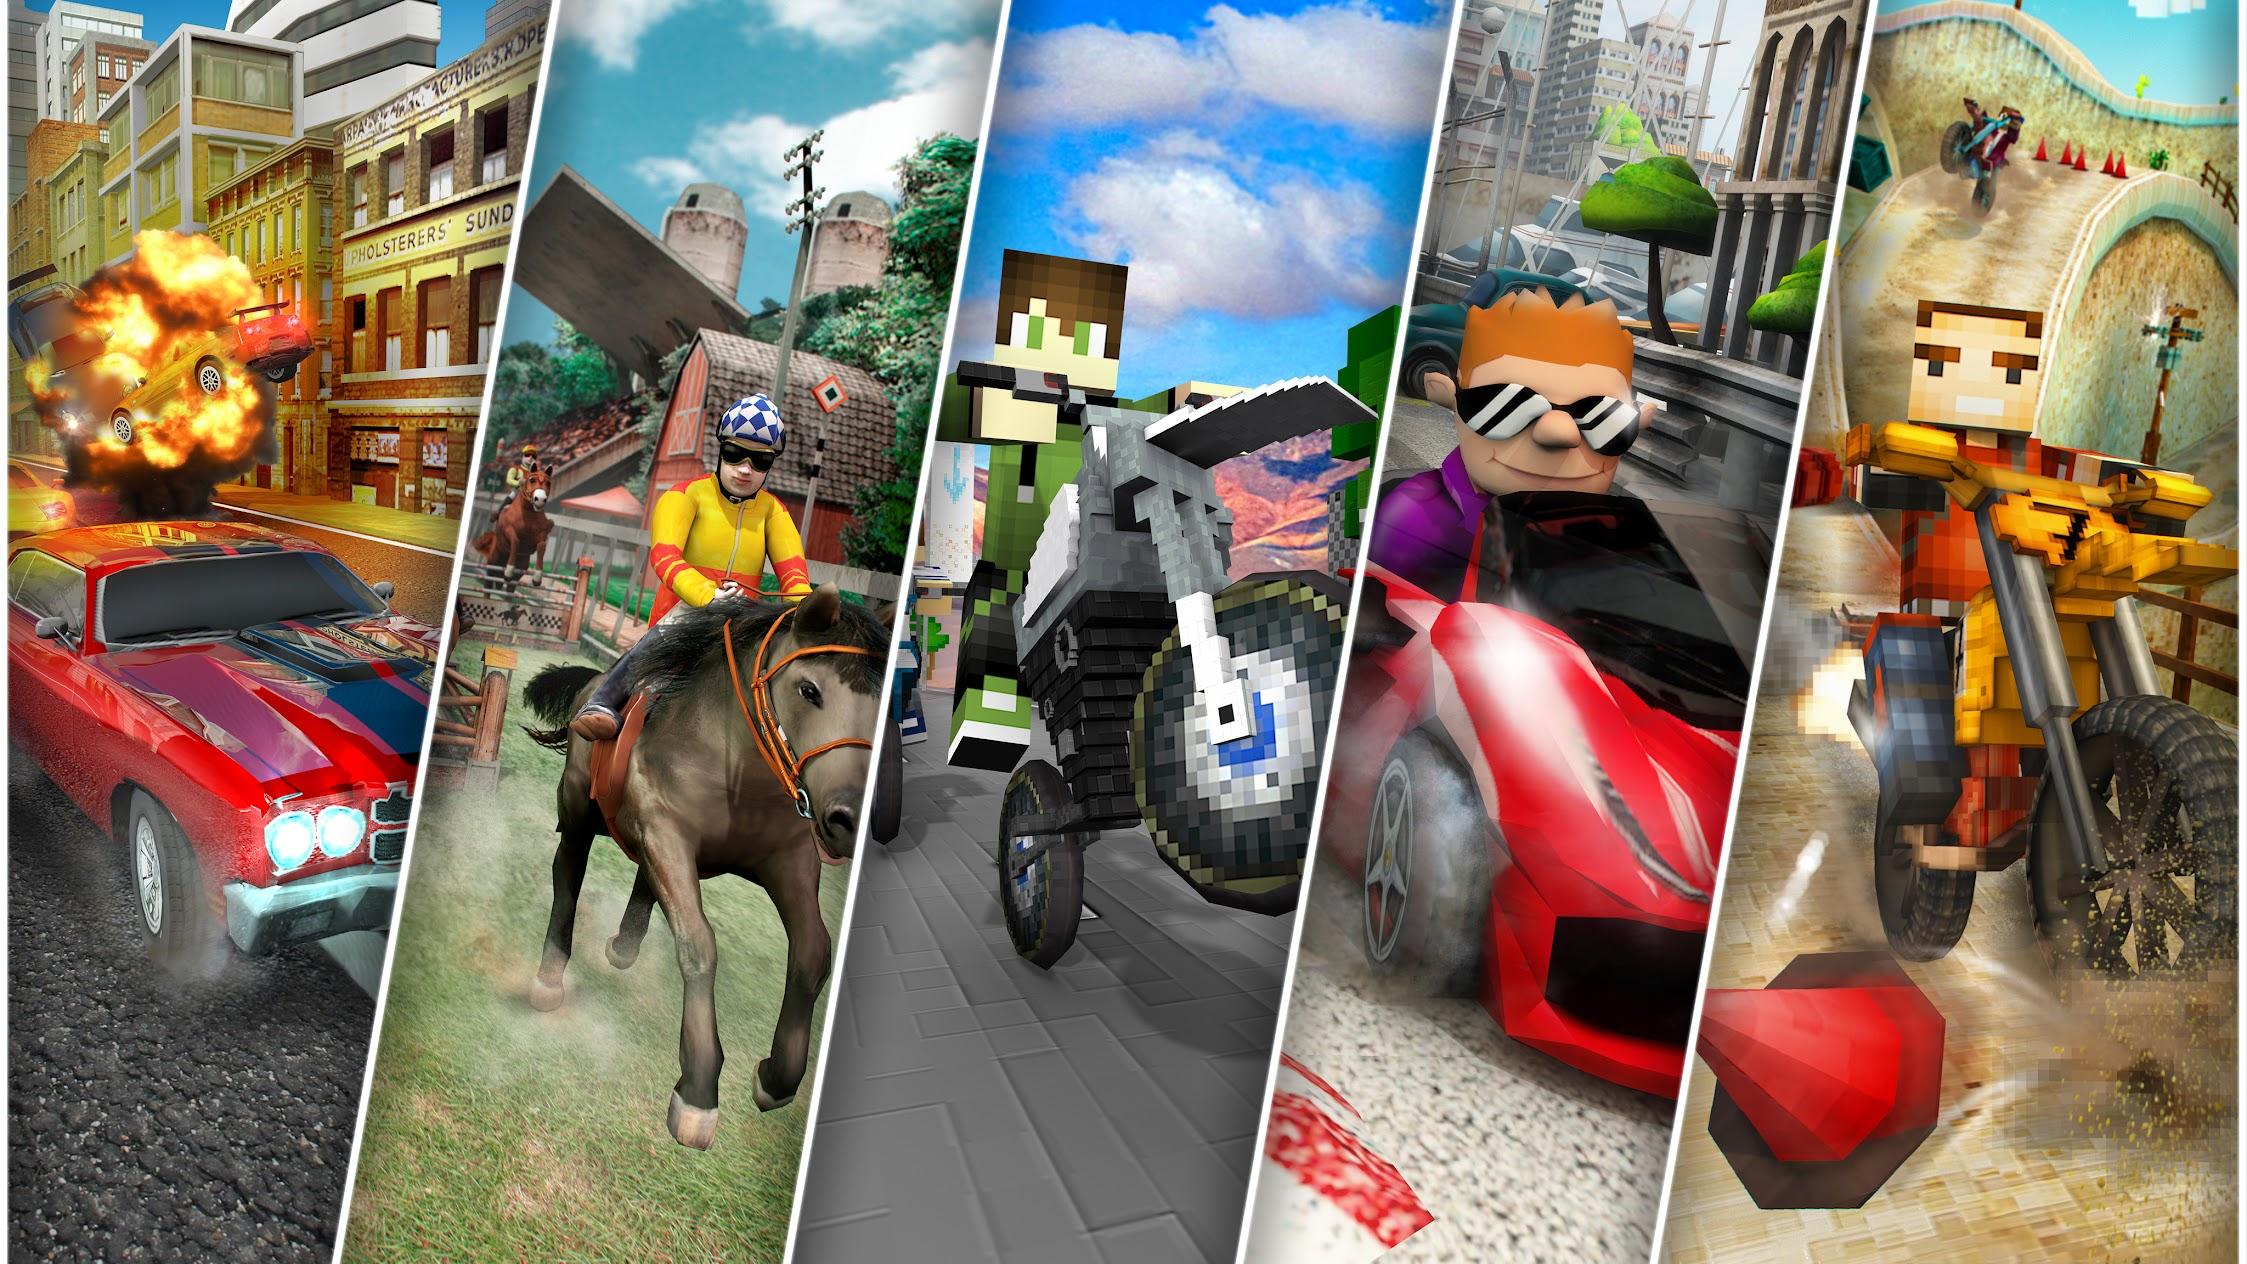 5,0★ Fernando Baro - Best Free Games